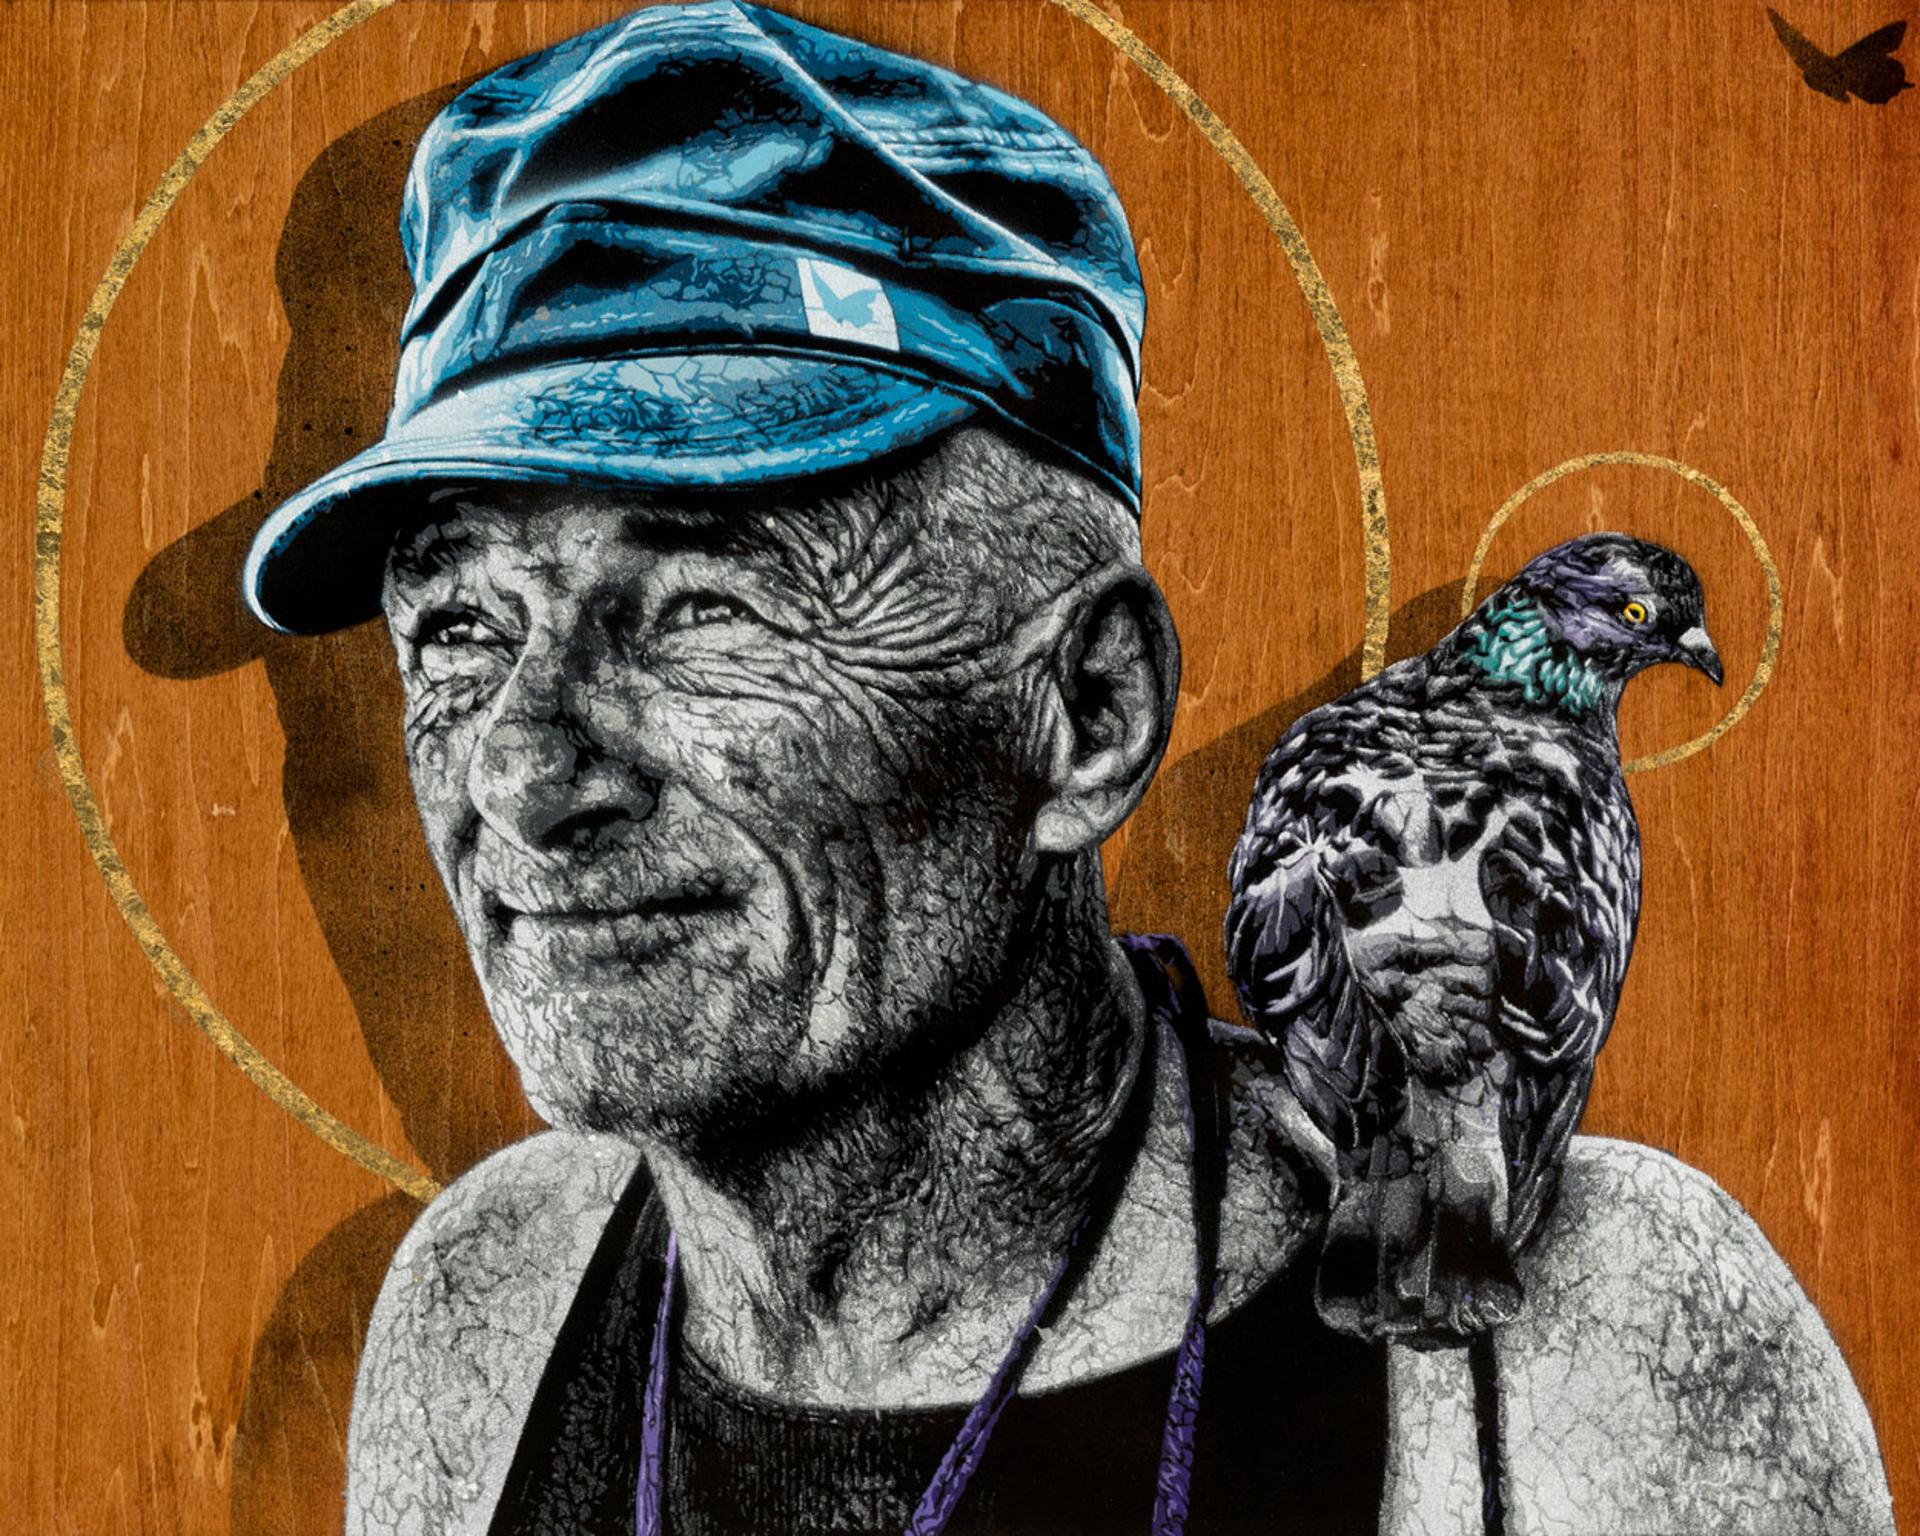 Birdman by Nils Westergard